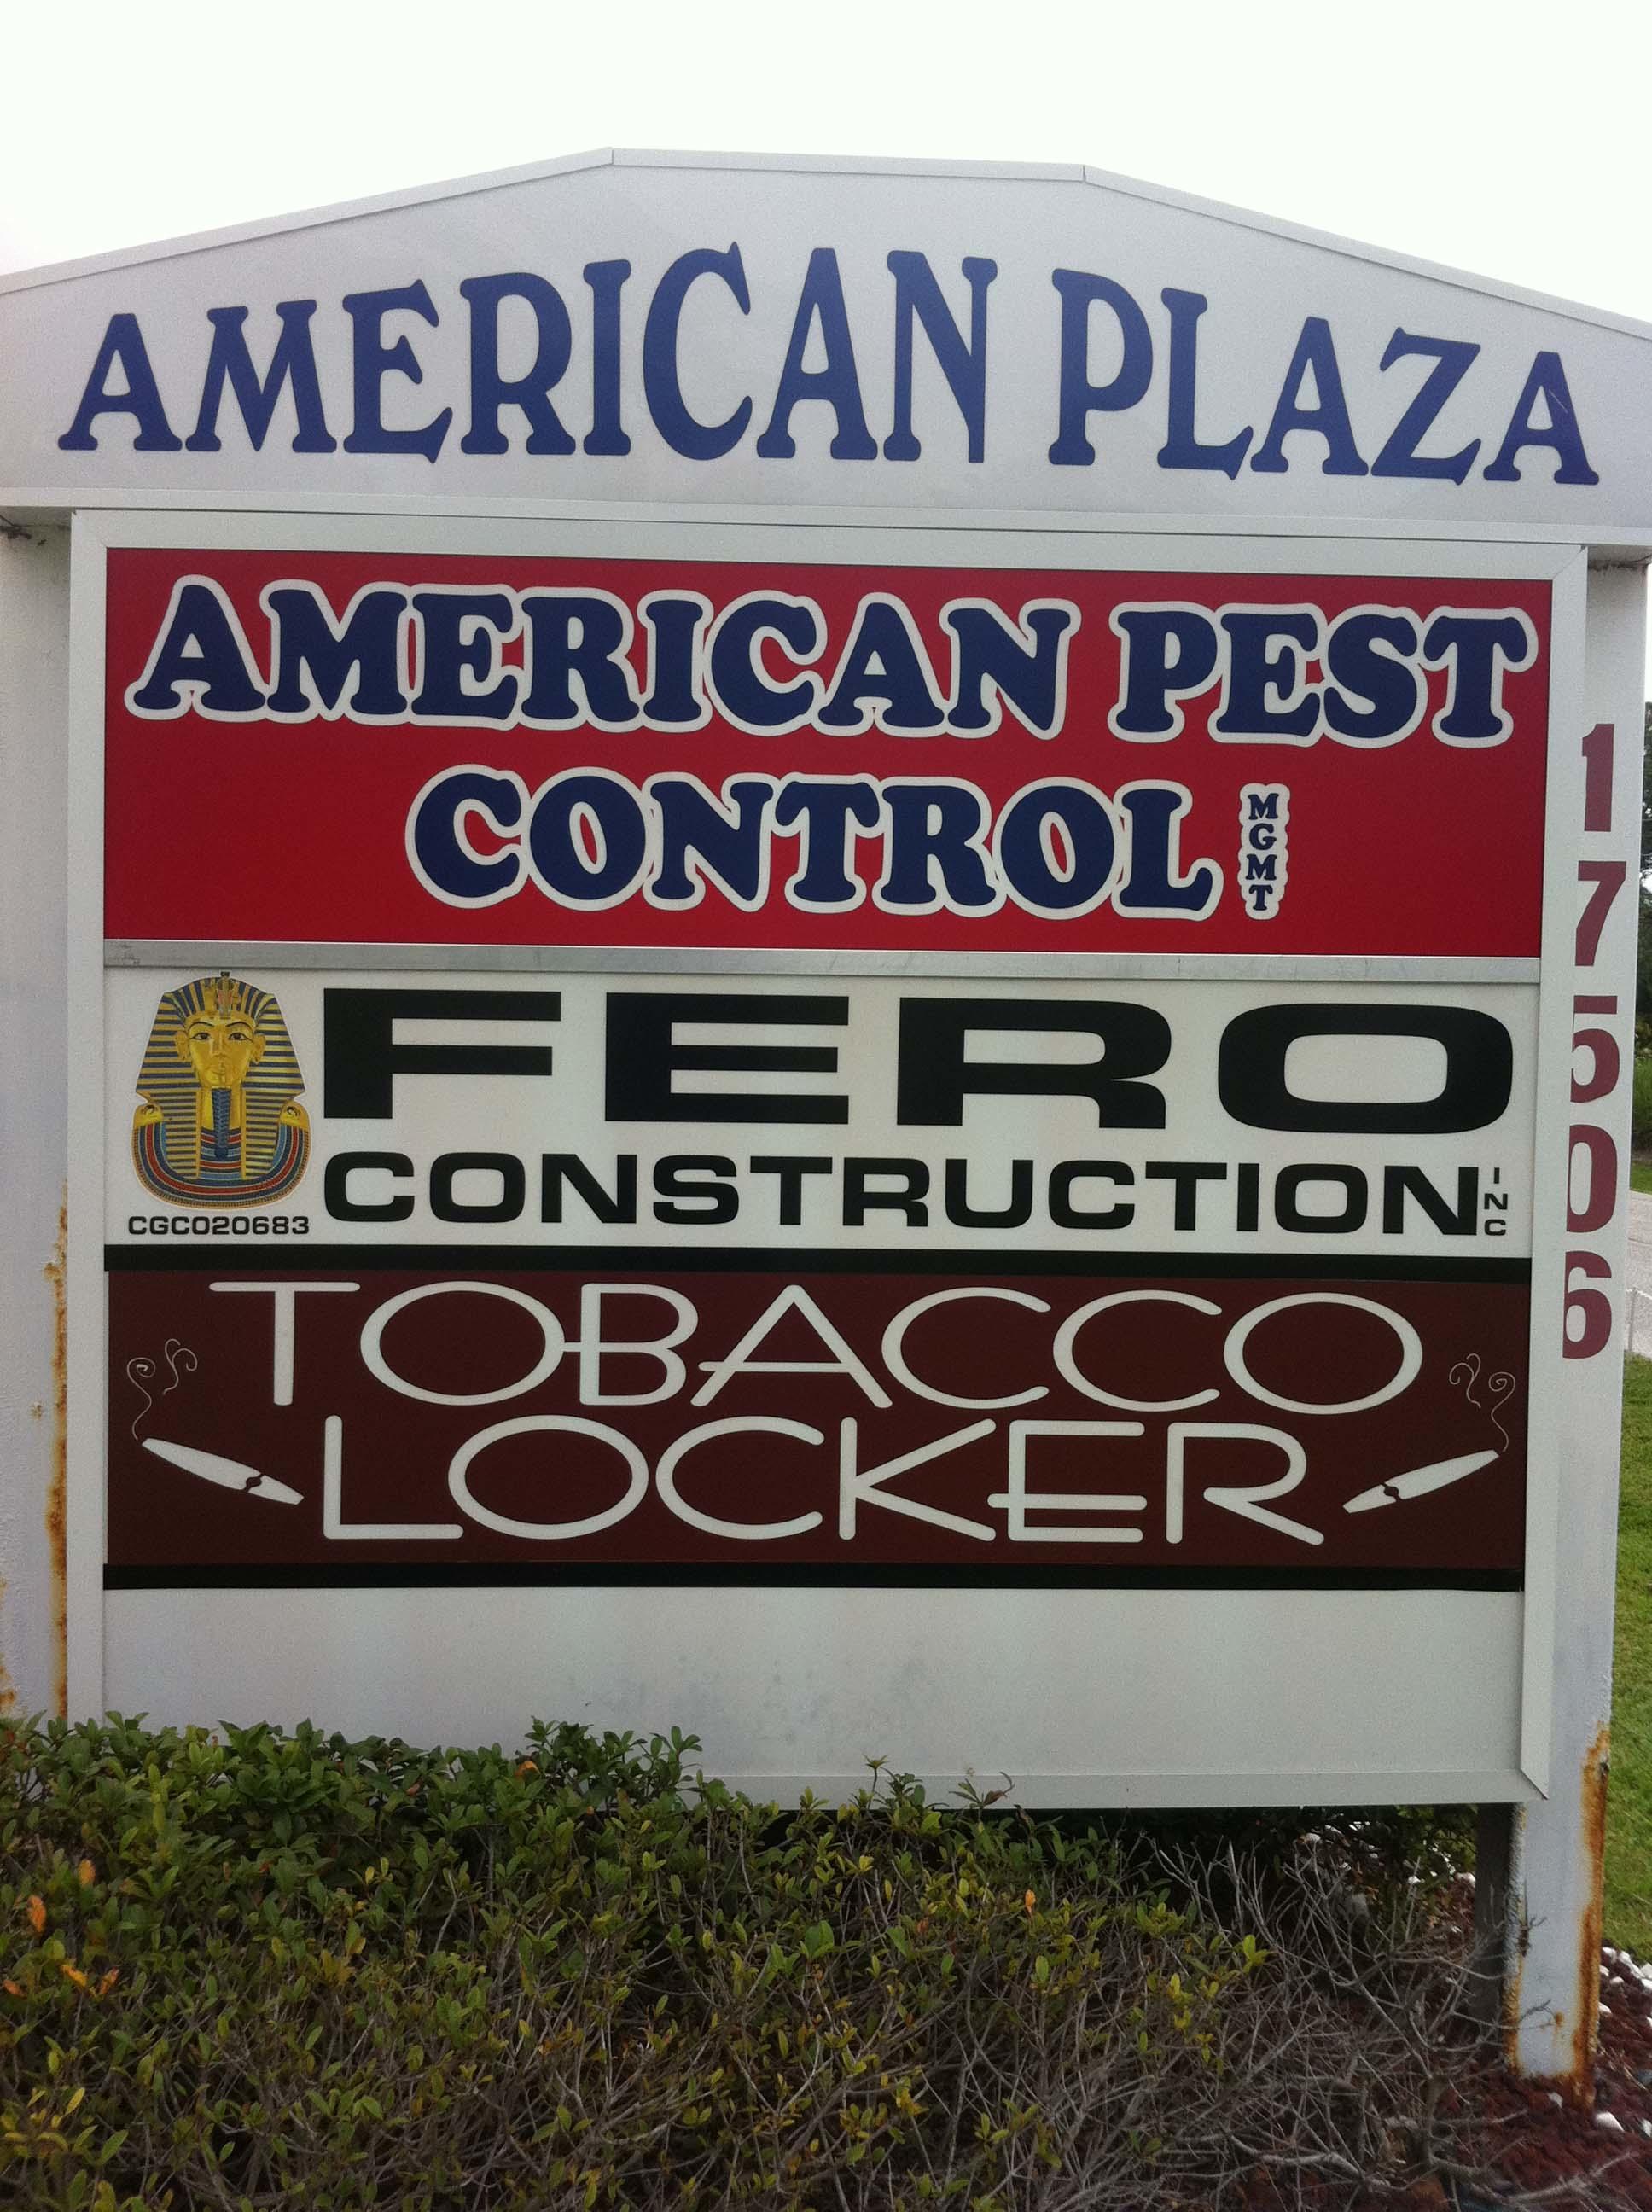 Tobacco Locker Cigar Bar image 1